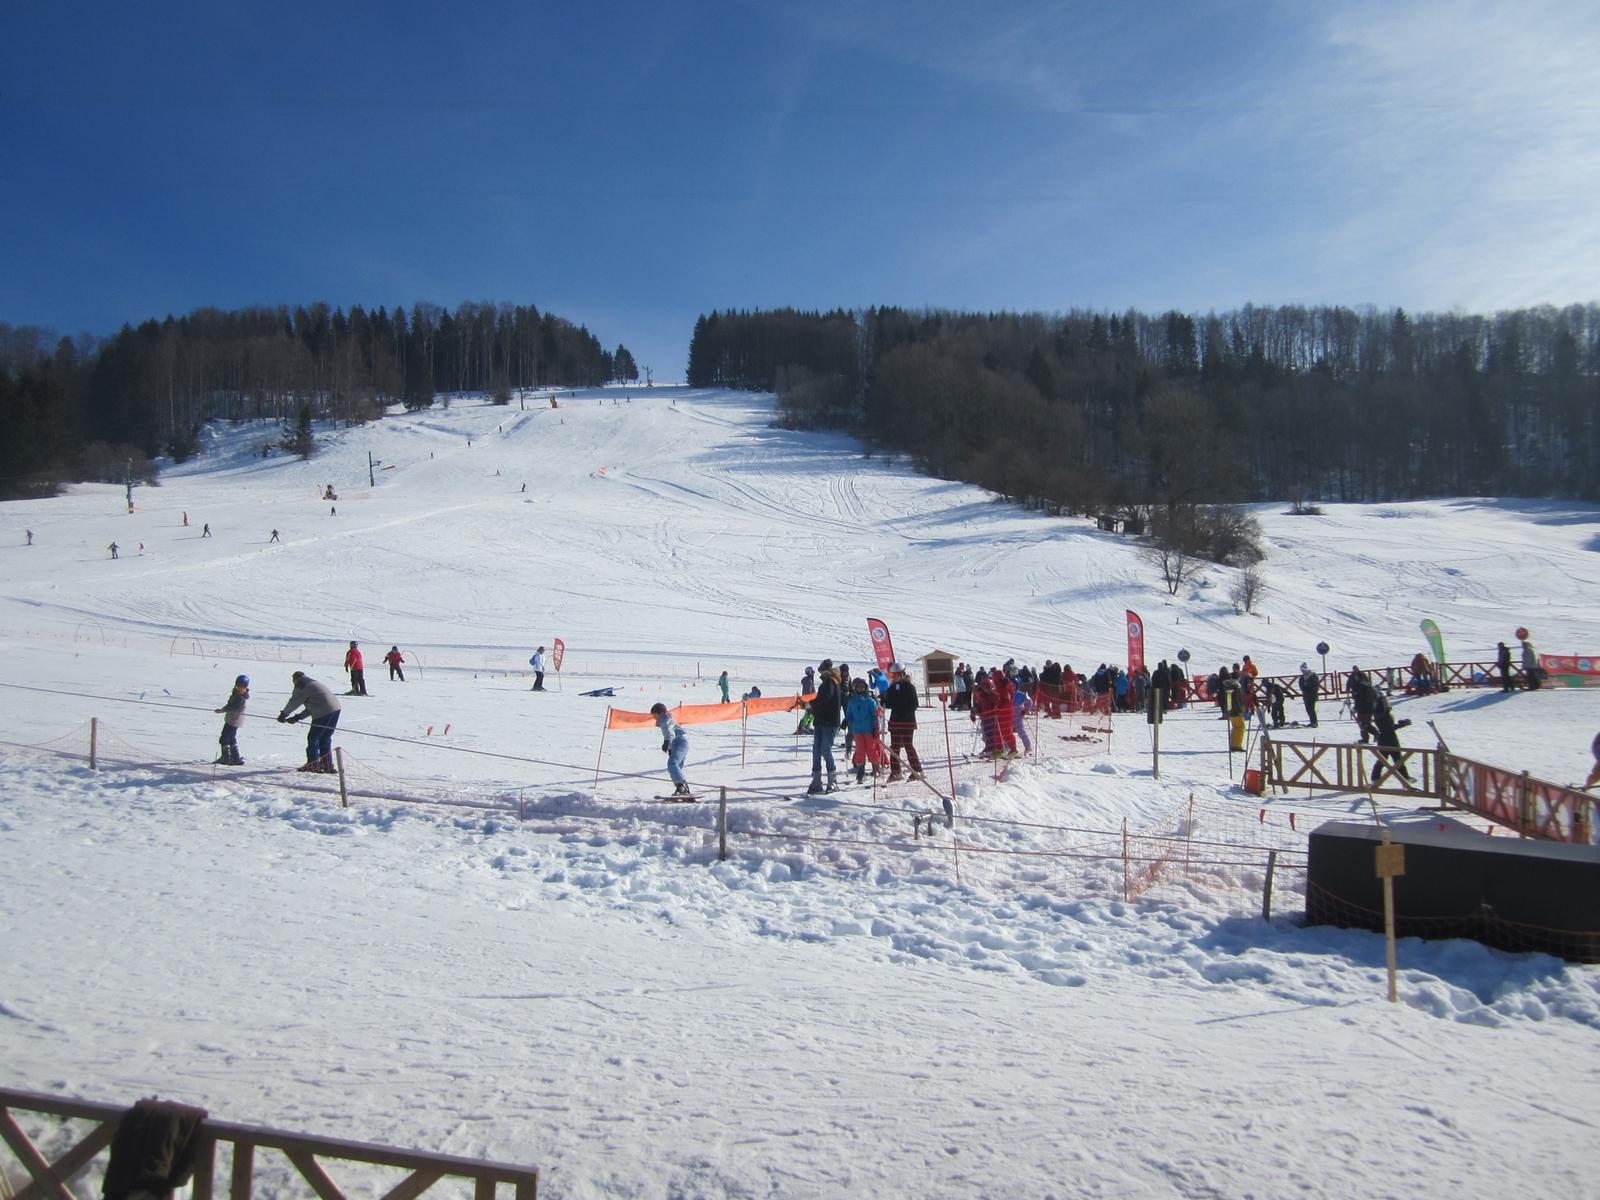 alpin1 Ski alpin